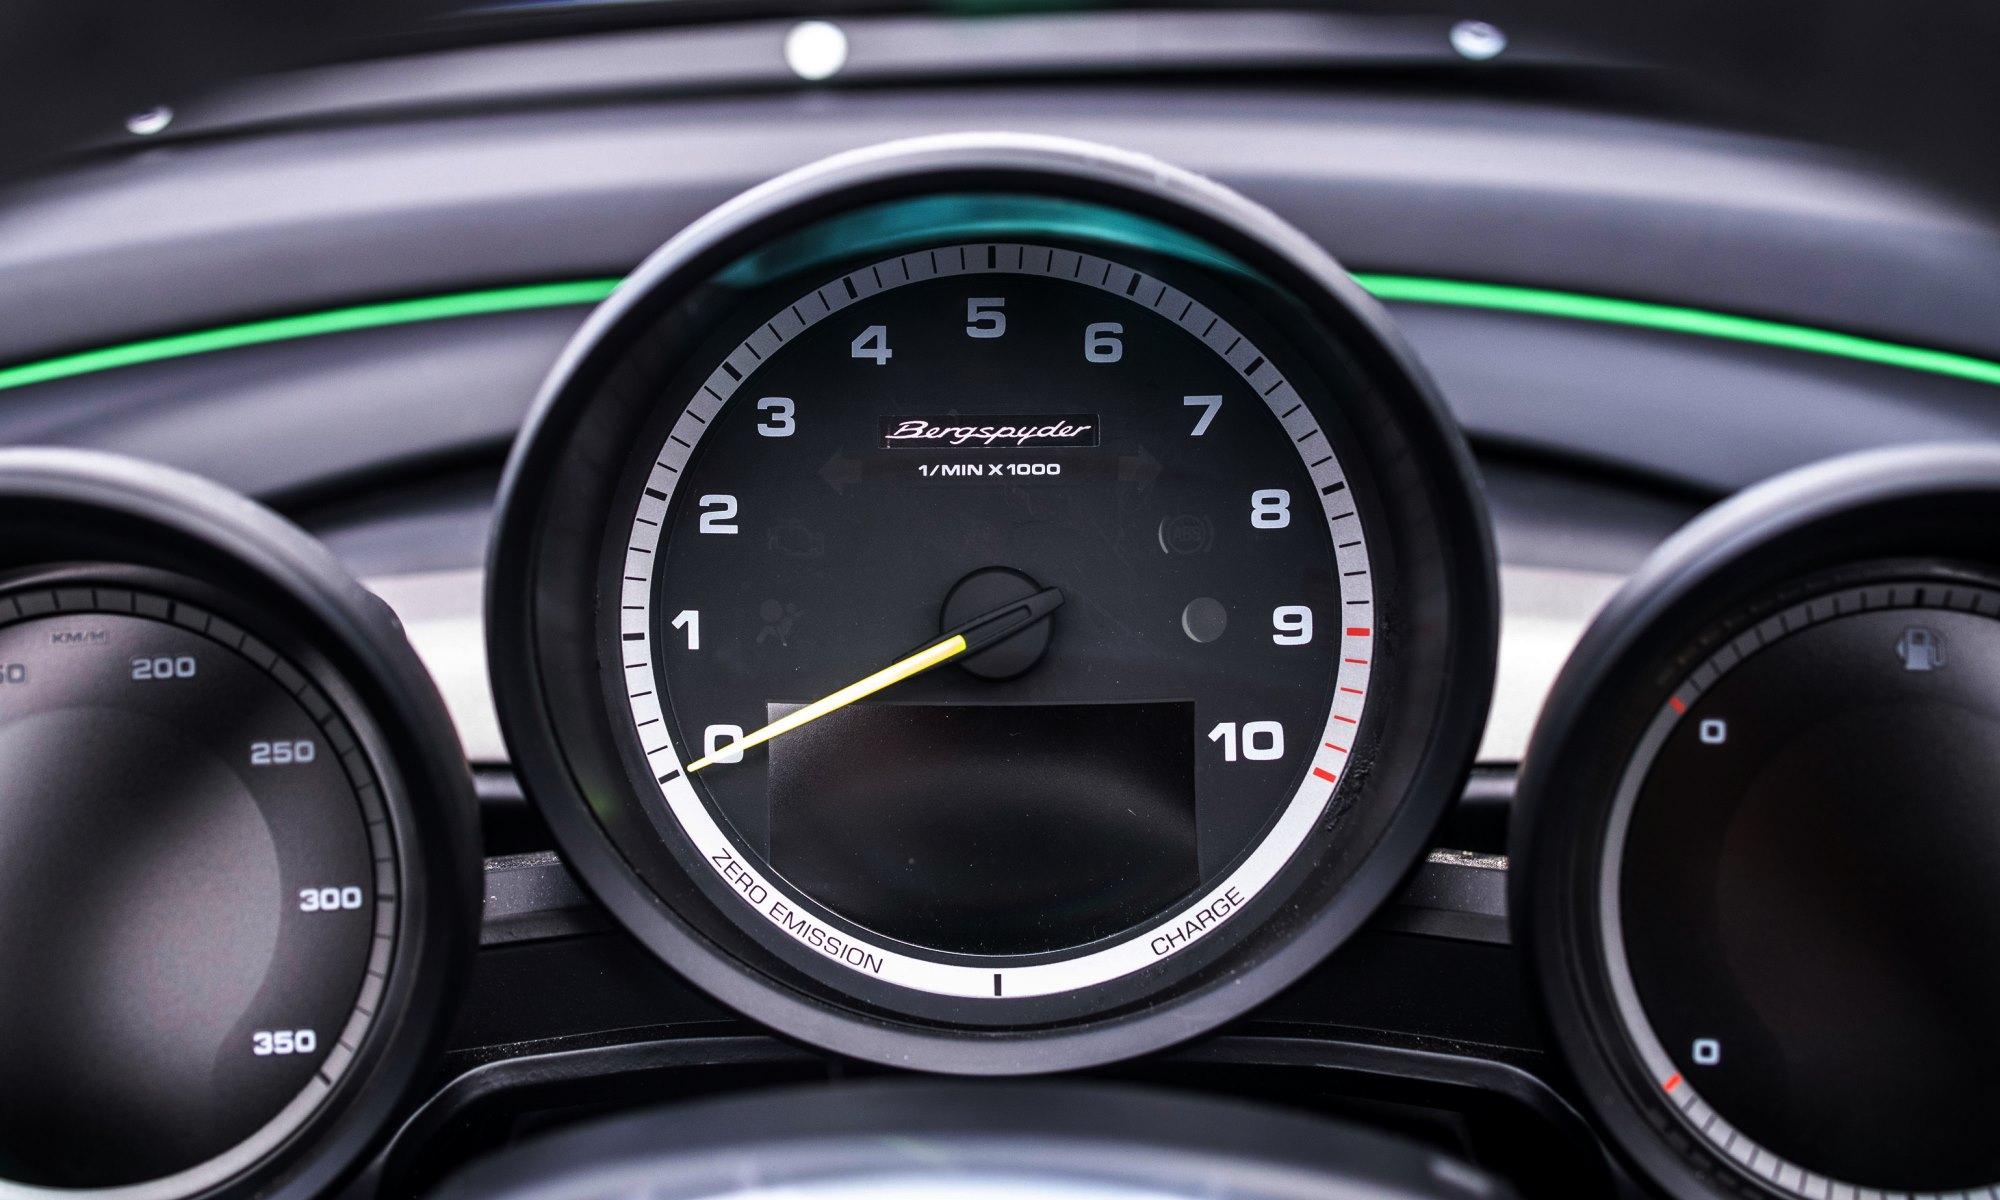 Porsche 981 Bergspyder instruments